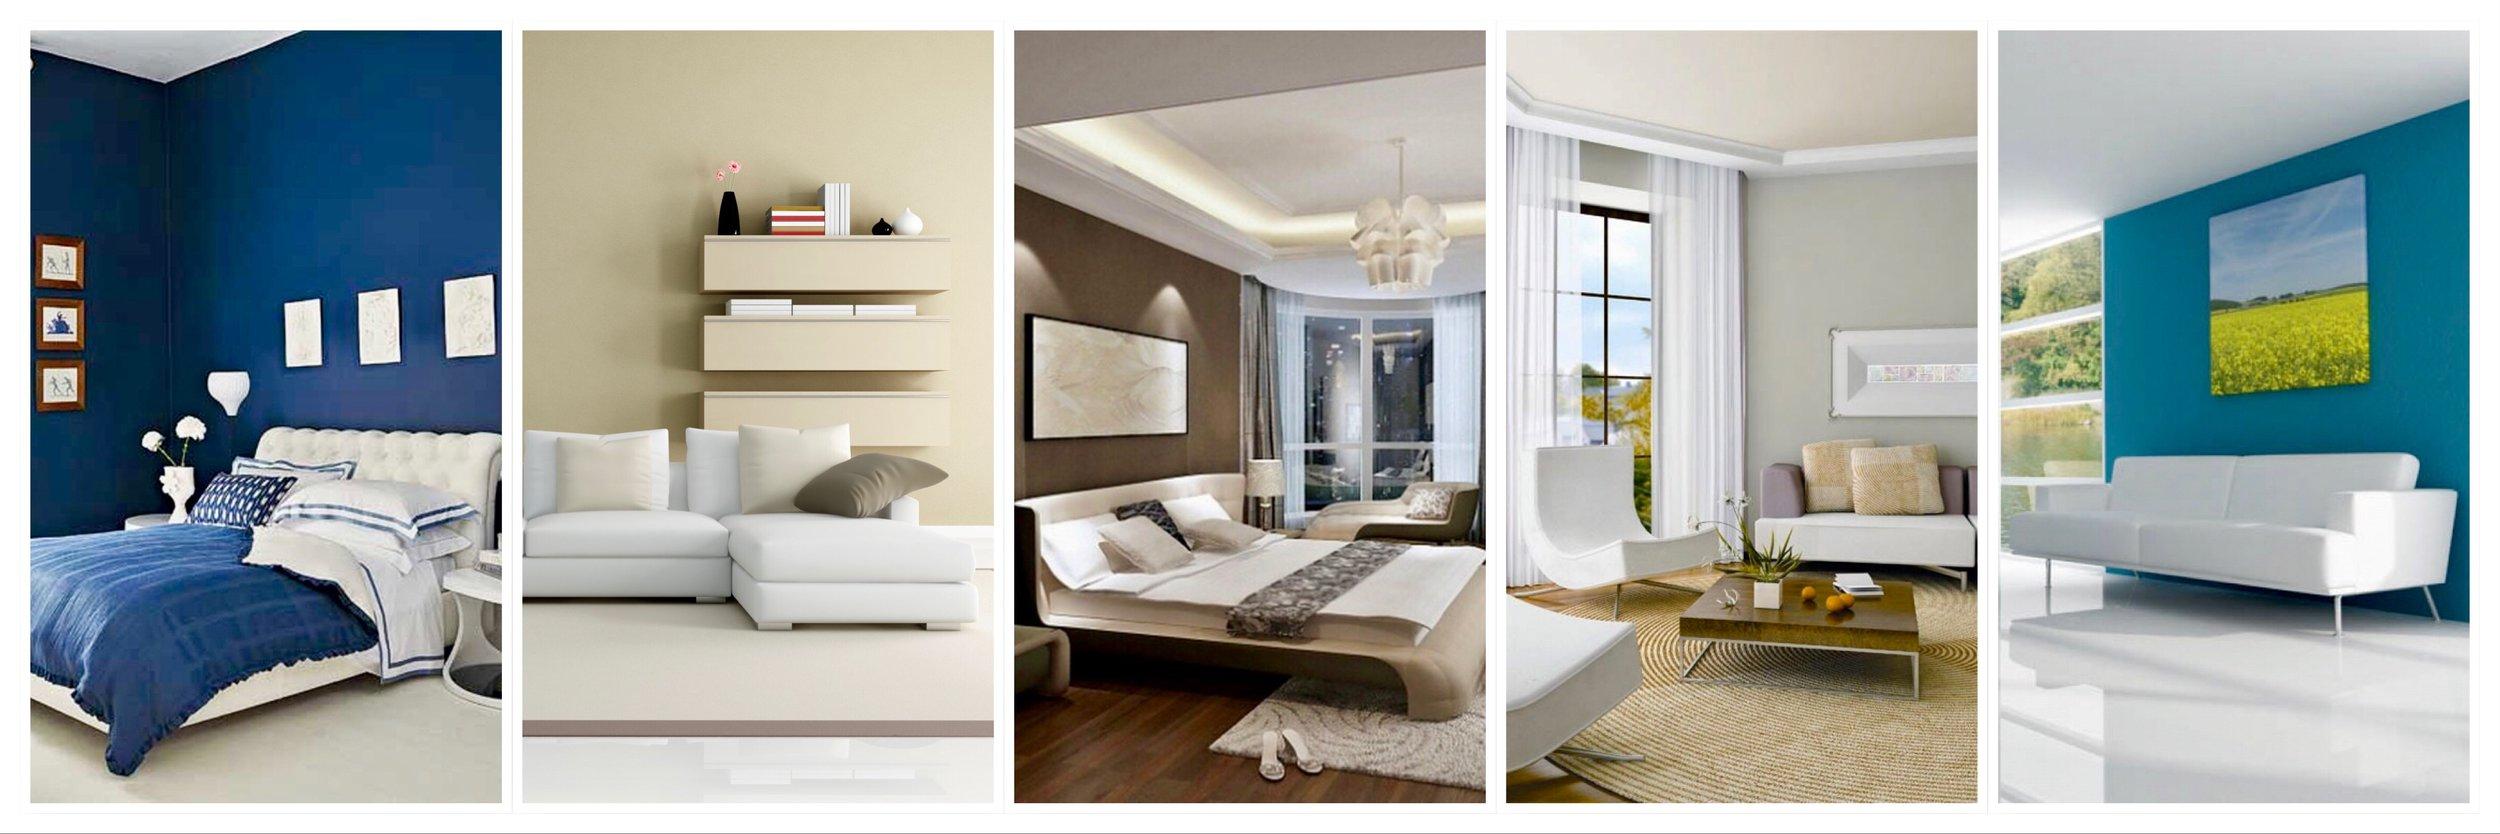 Interior Painting Ideas Panoramic Collage.JPEG